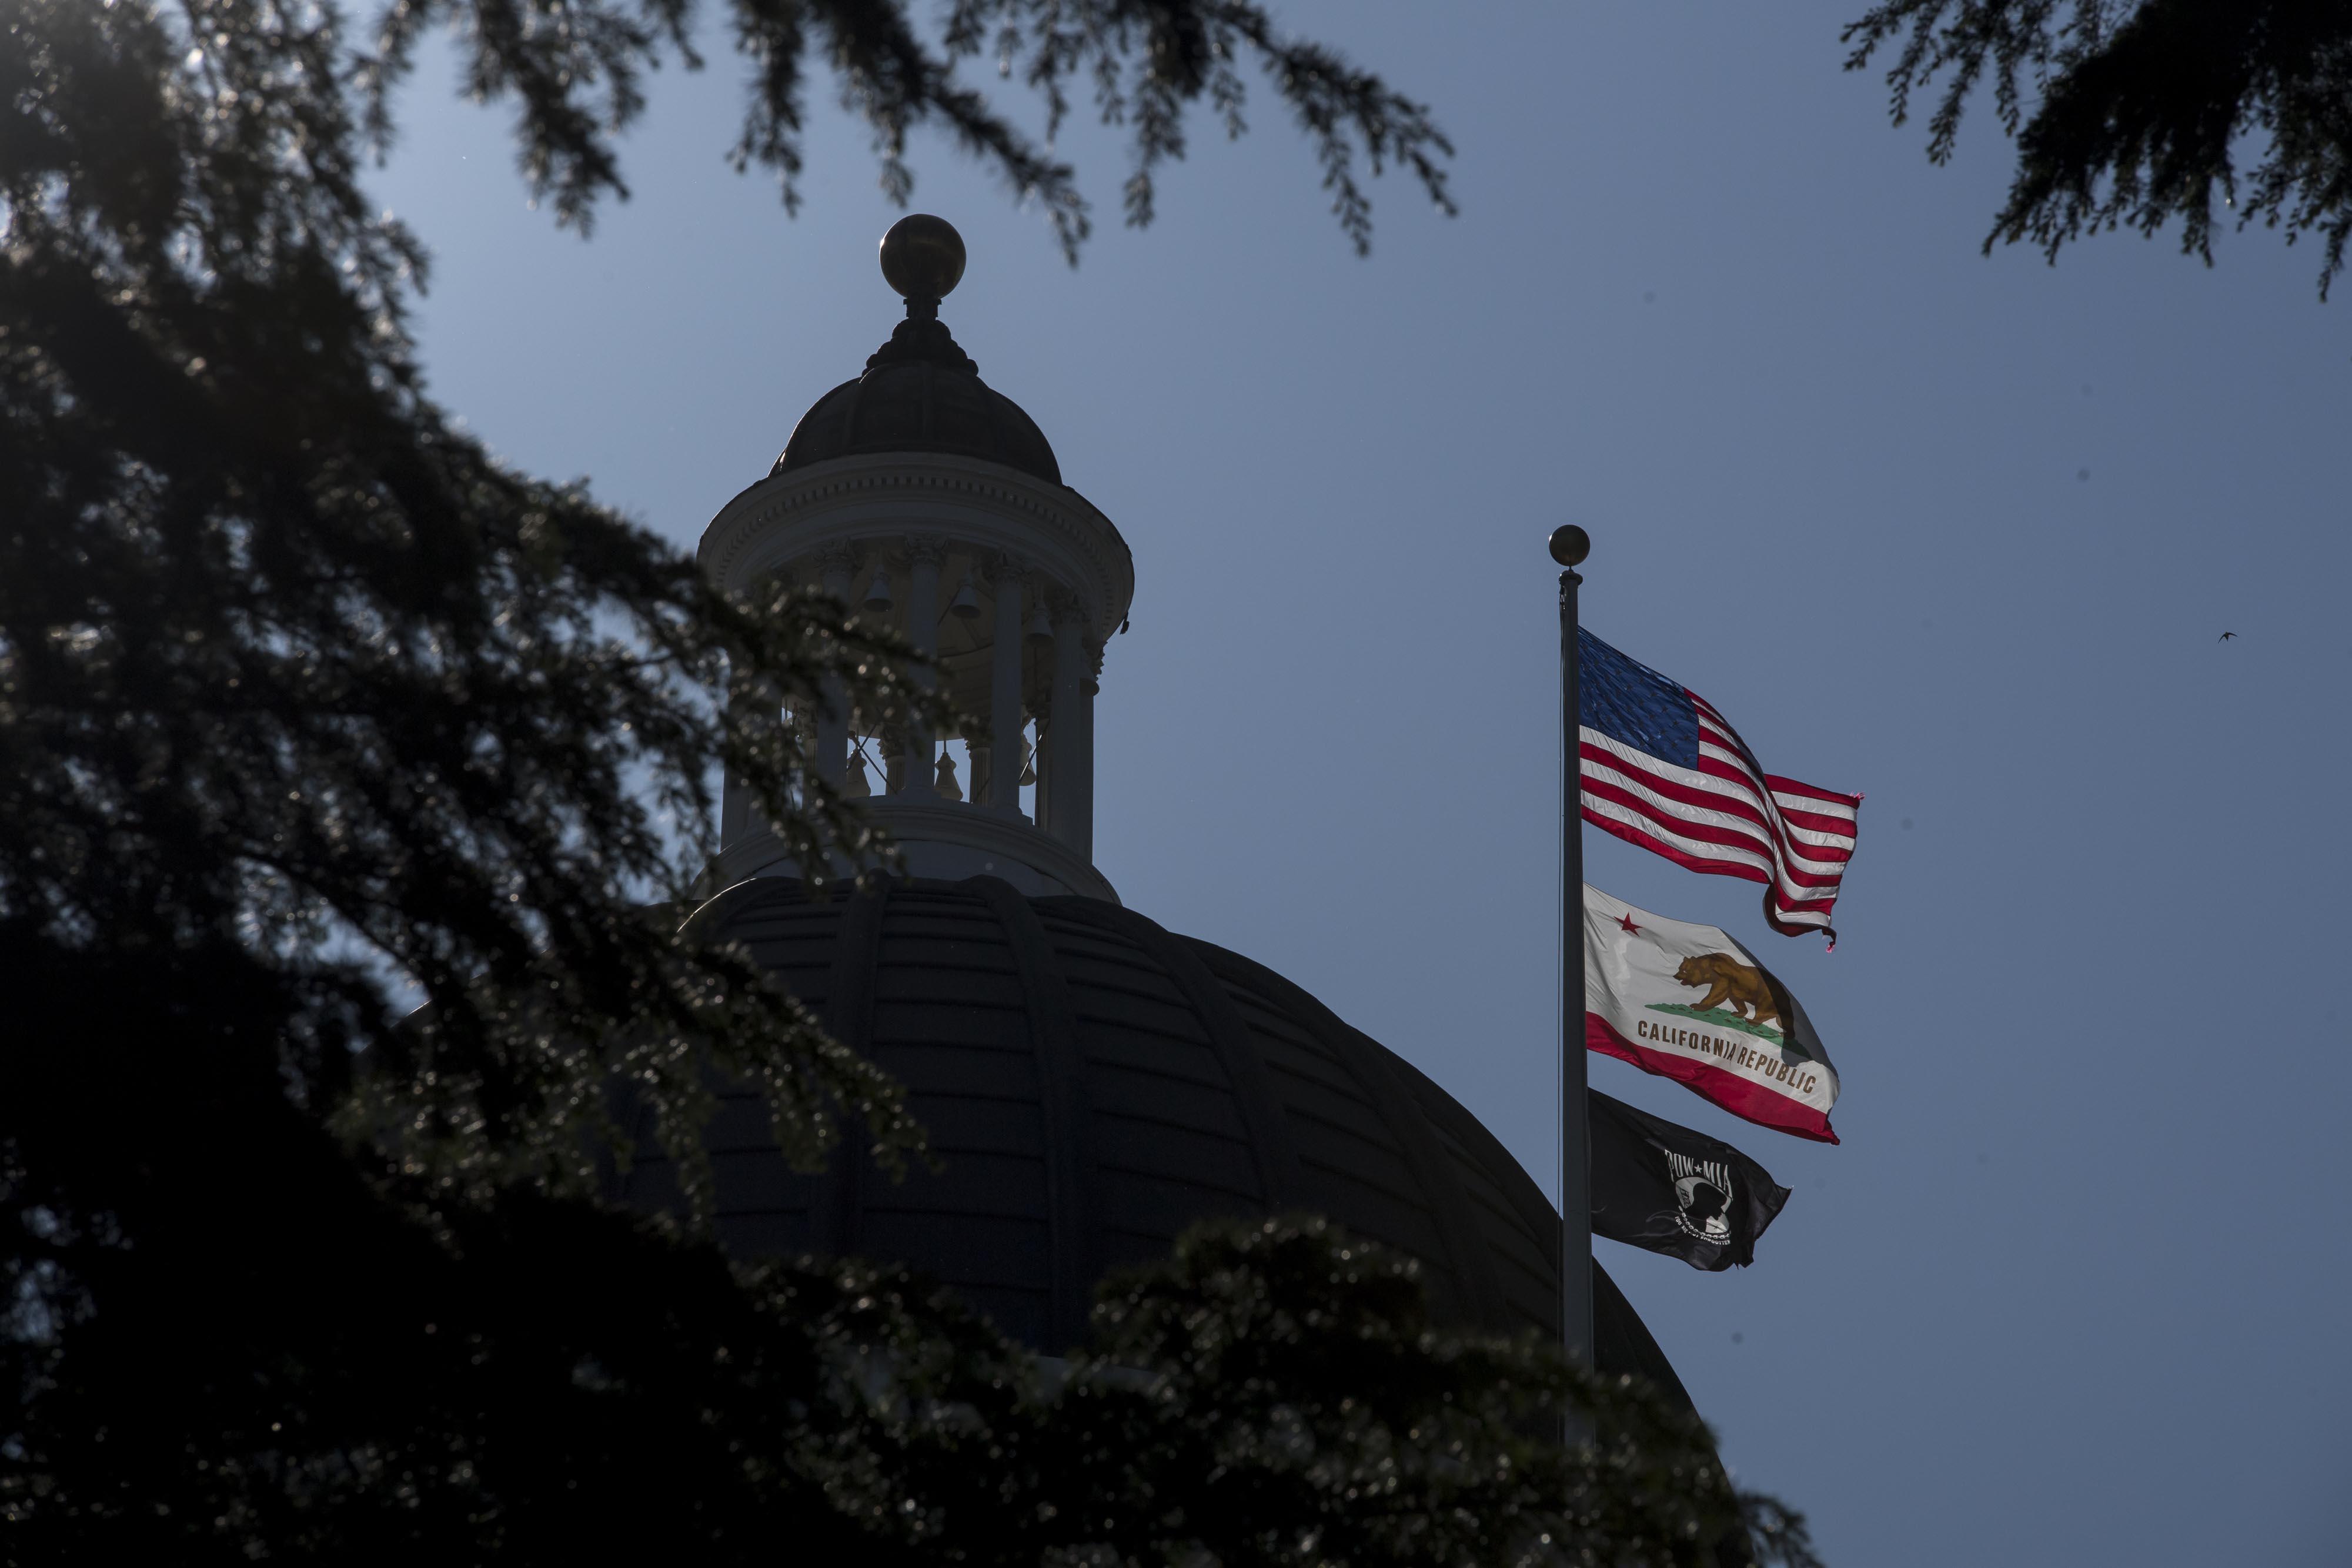 https://assets.sourcemedia.com/16/48/e1bd7f2b4c3f875486fadc1fdc78/california-state-capitol-bl.jpg